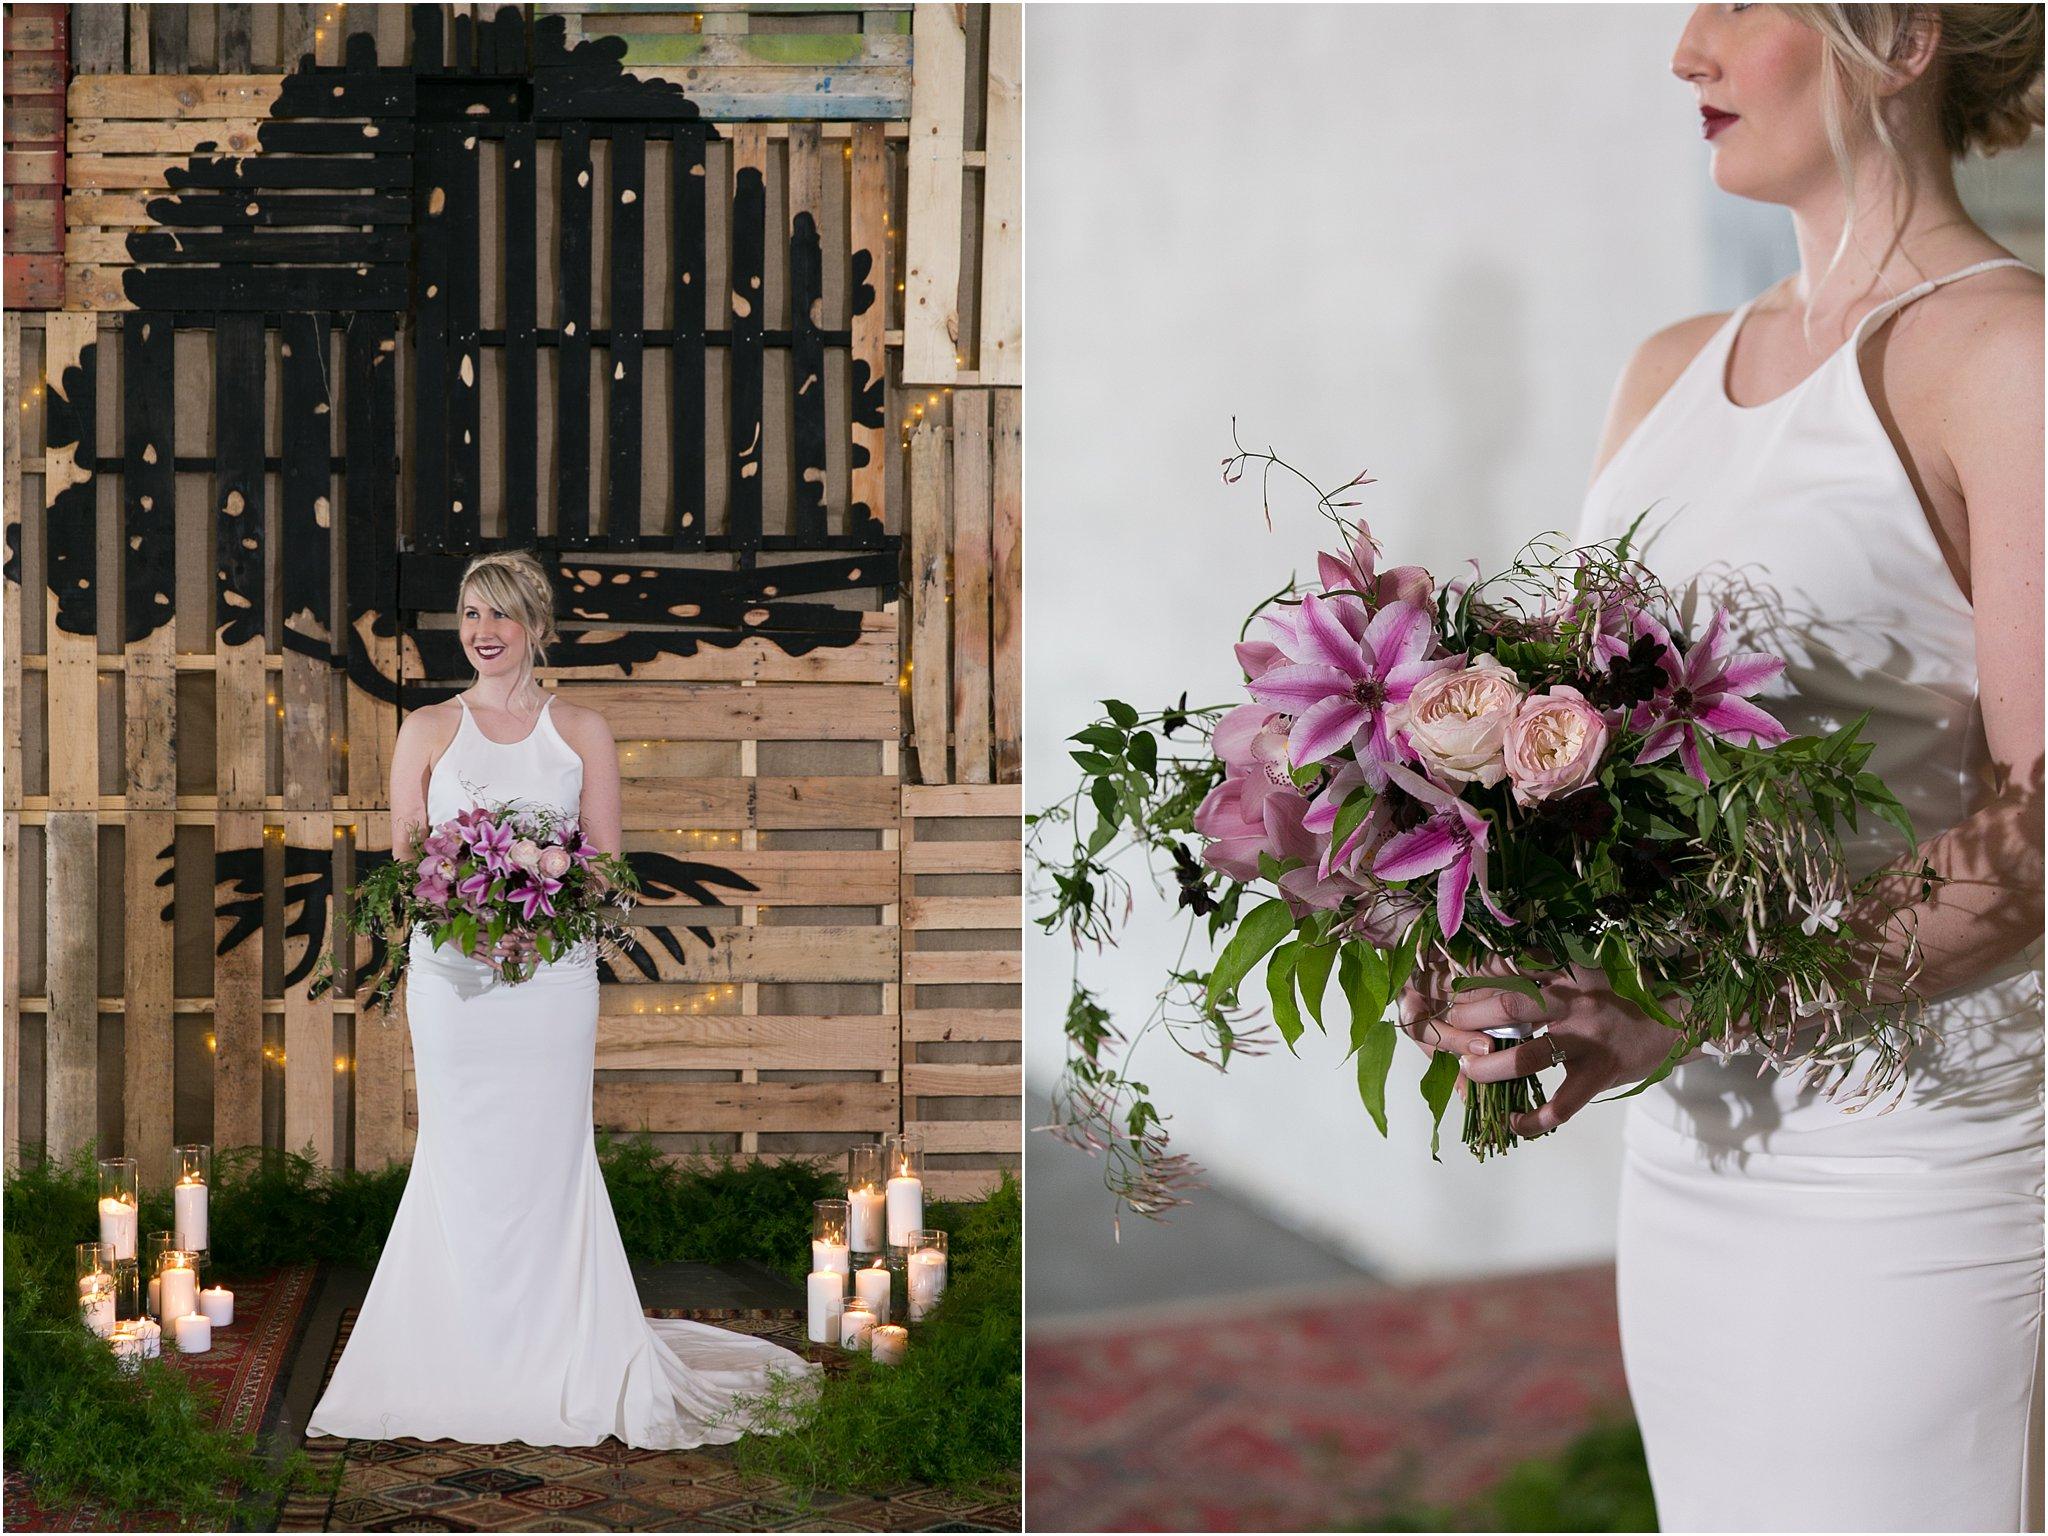 jessica_ryan_photography_oconnor_brewing_wedding_oconnor_brewing_co_norfolk_virginia_roost_flowers_blue_birds_garage__0789